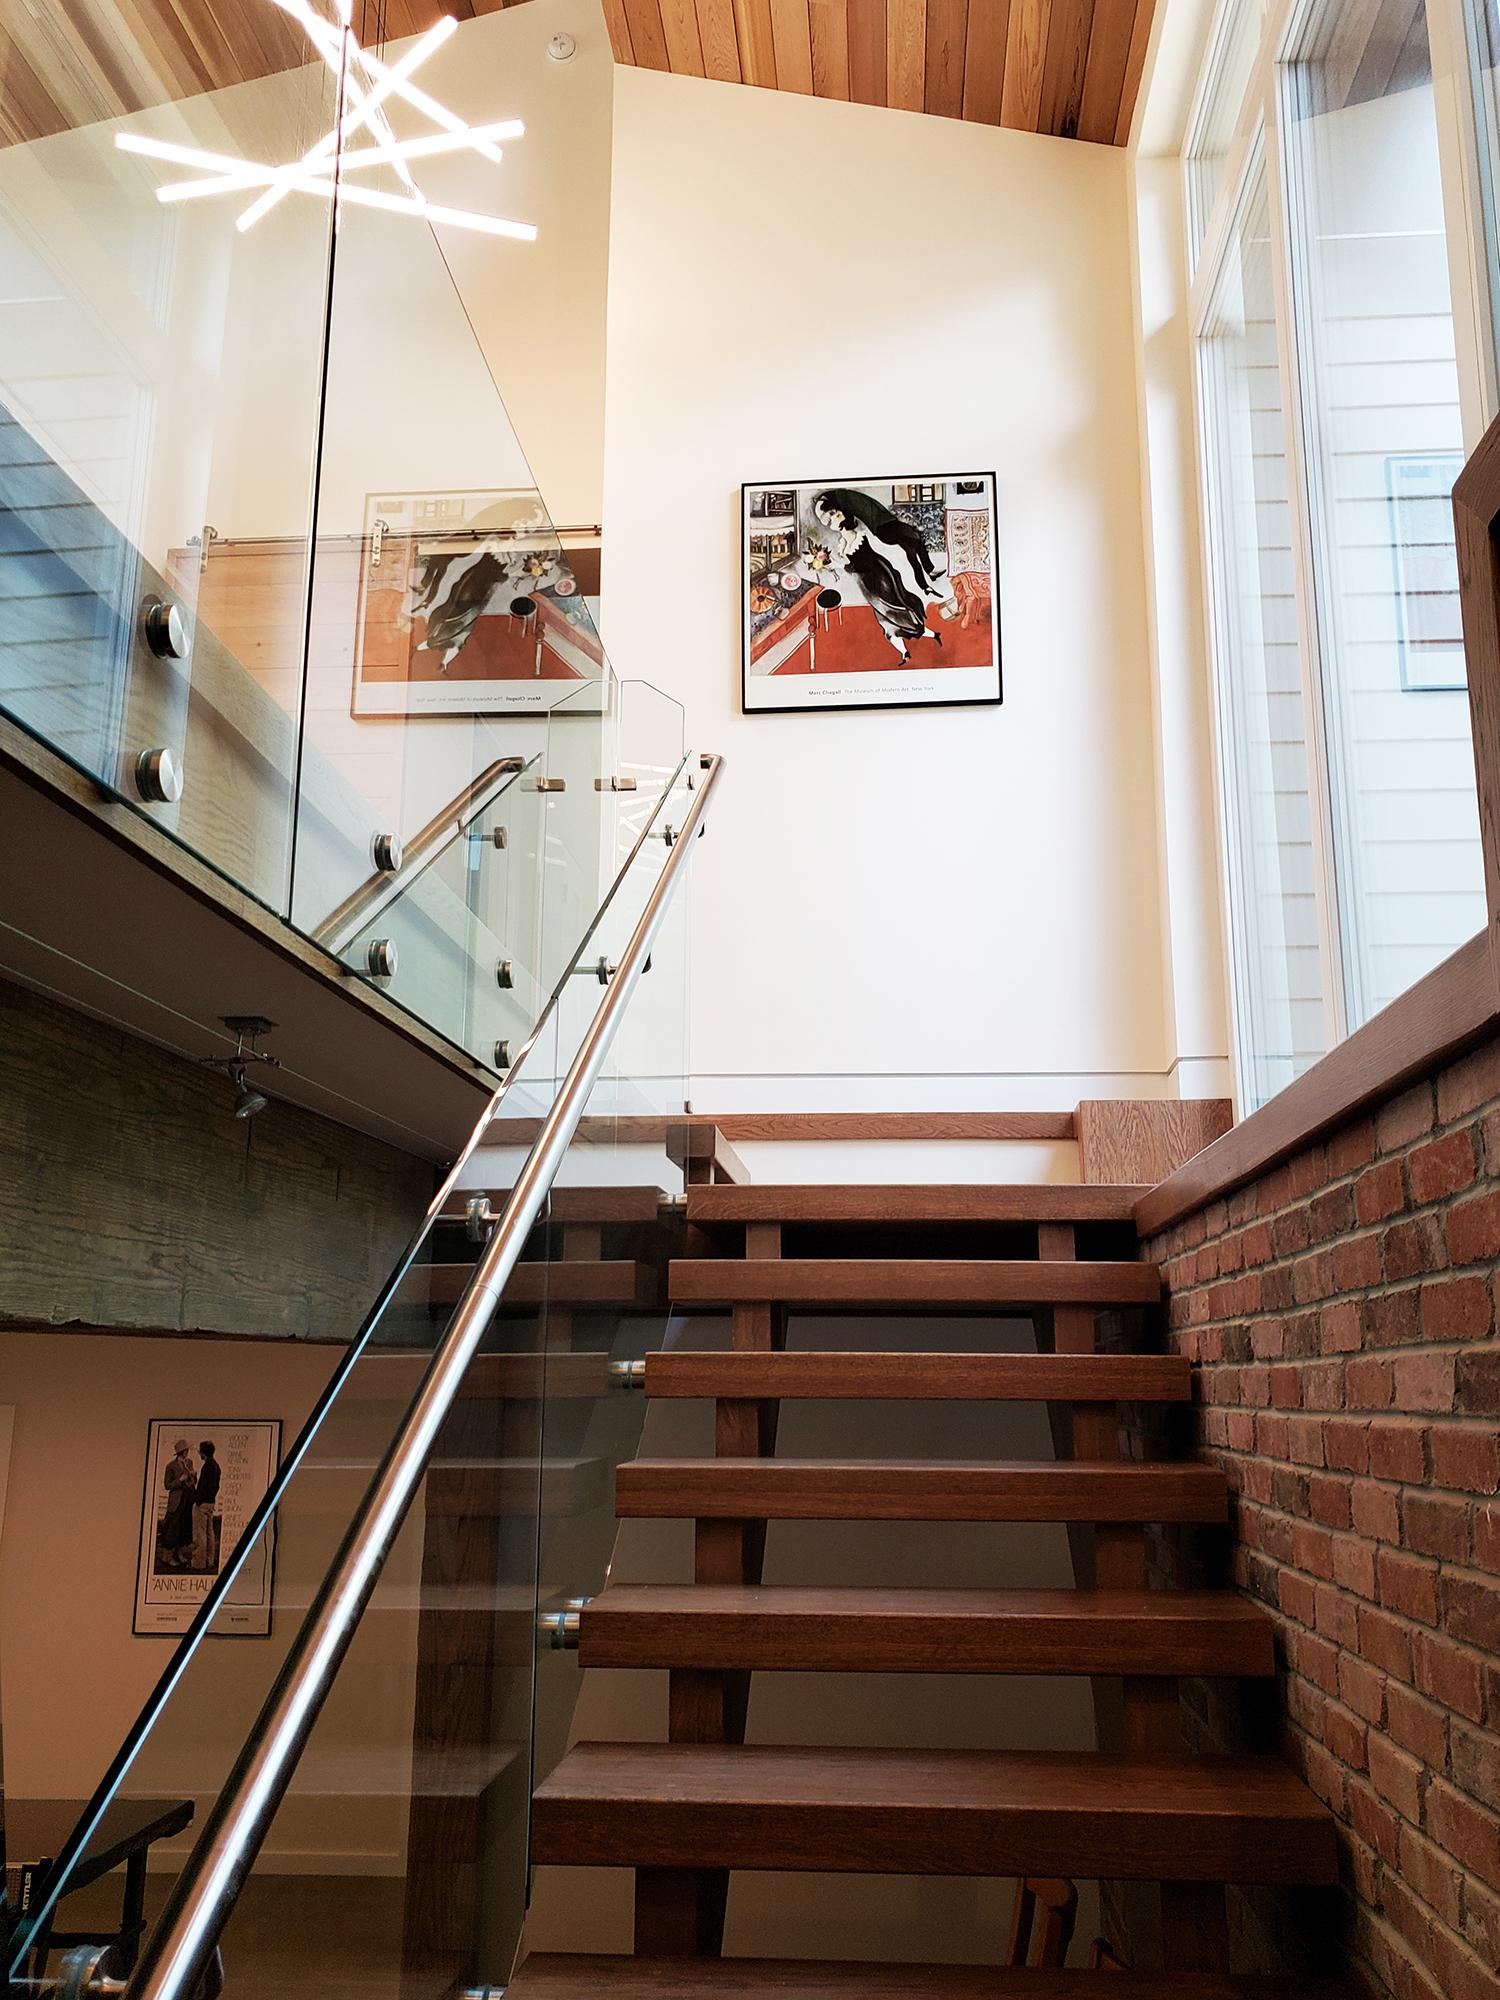 vertical staircase.jpg